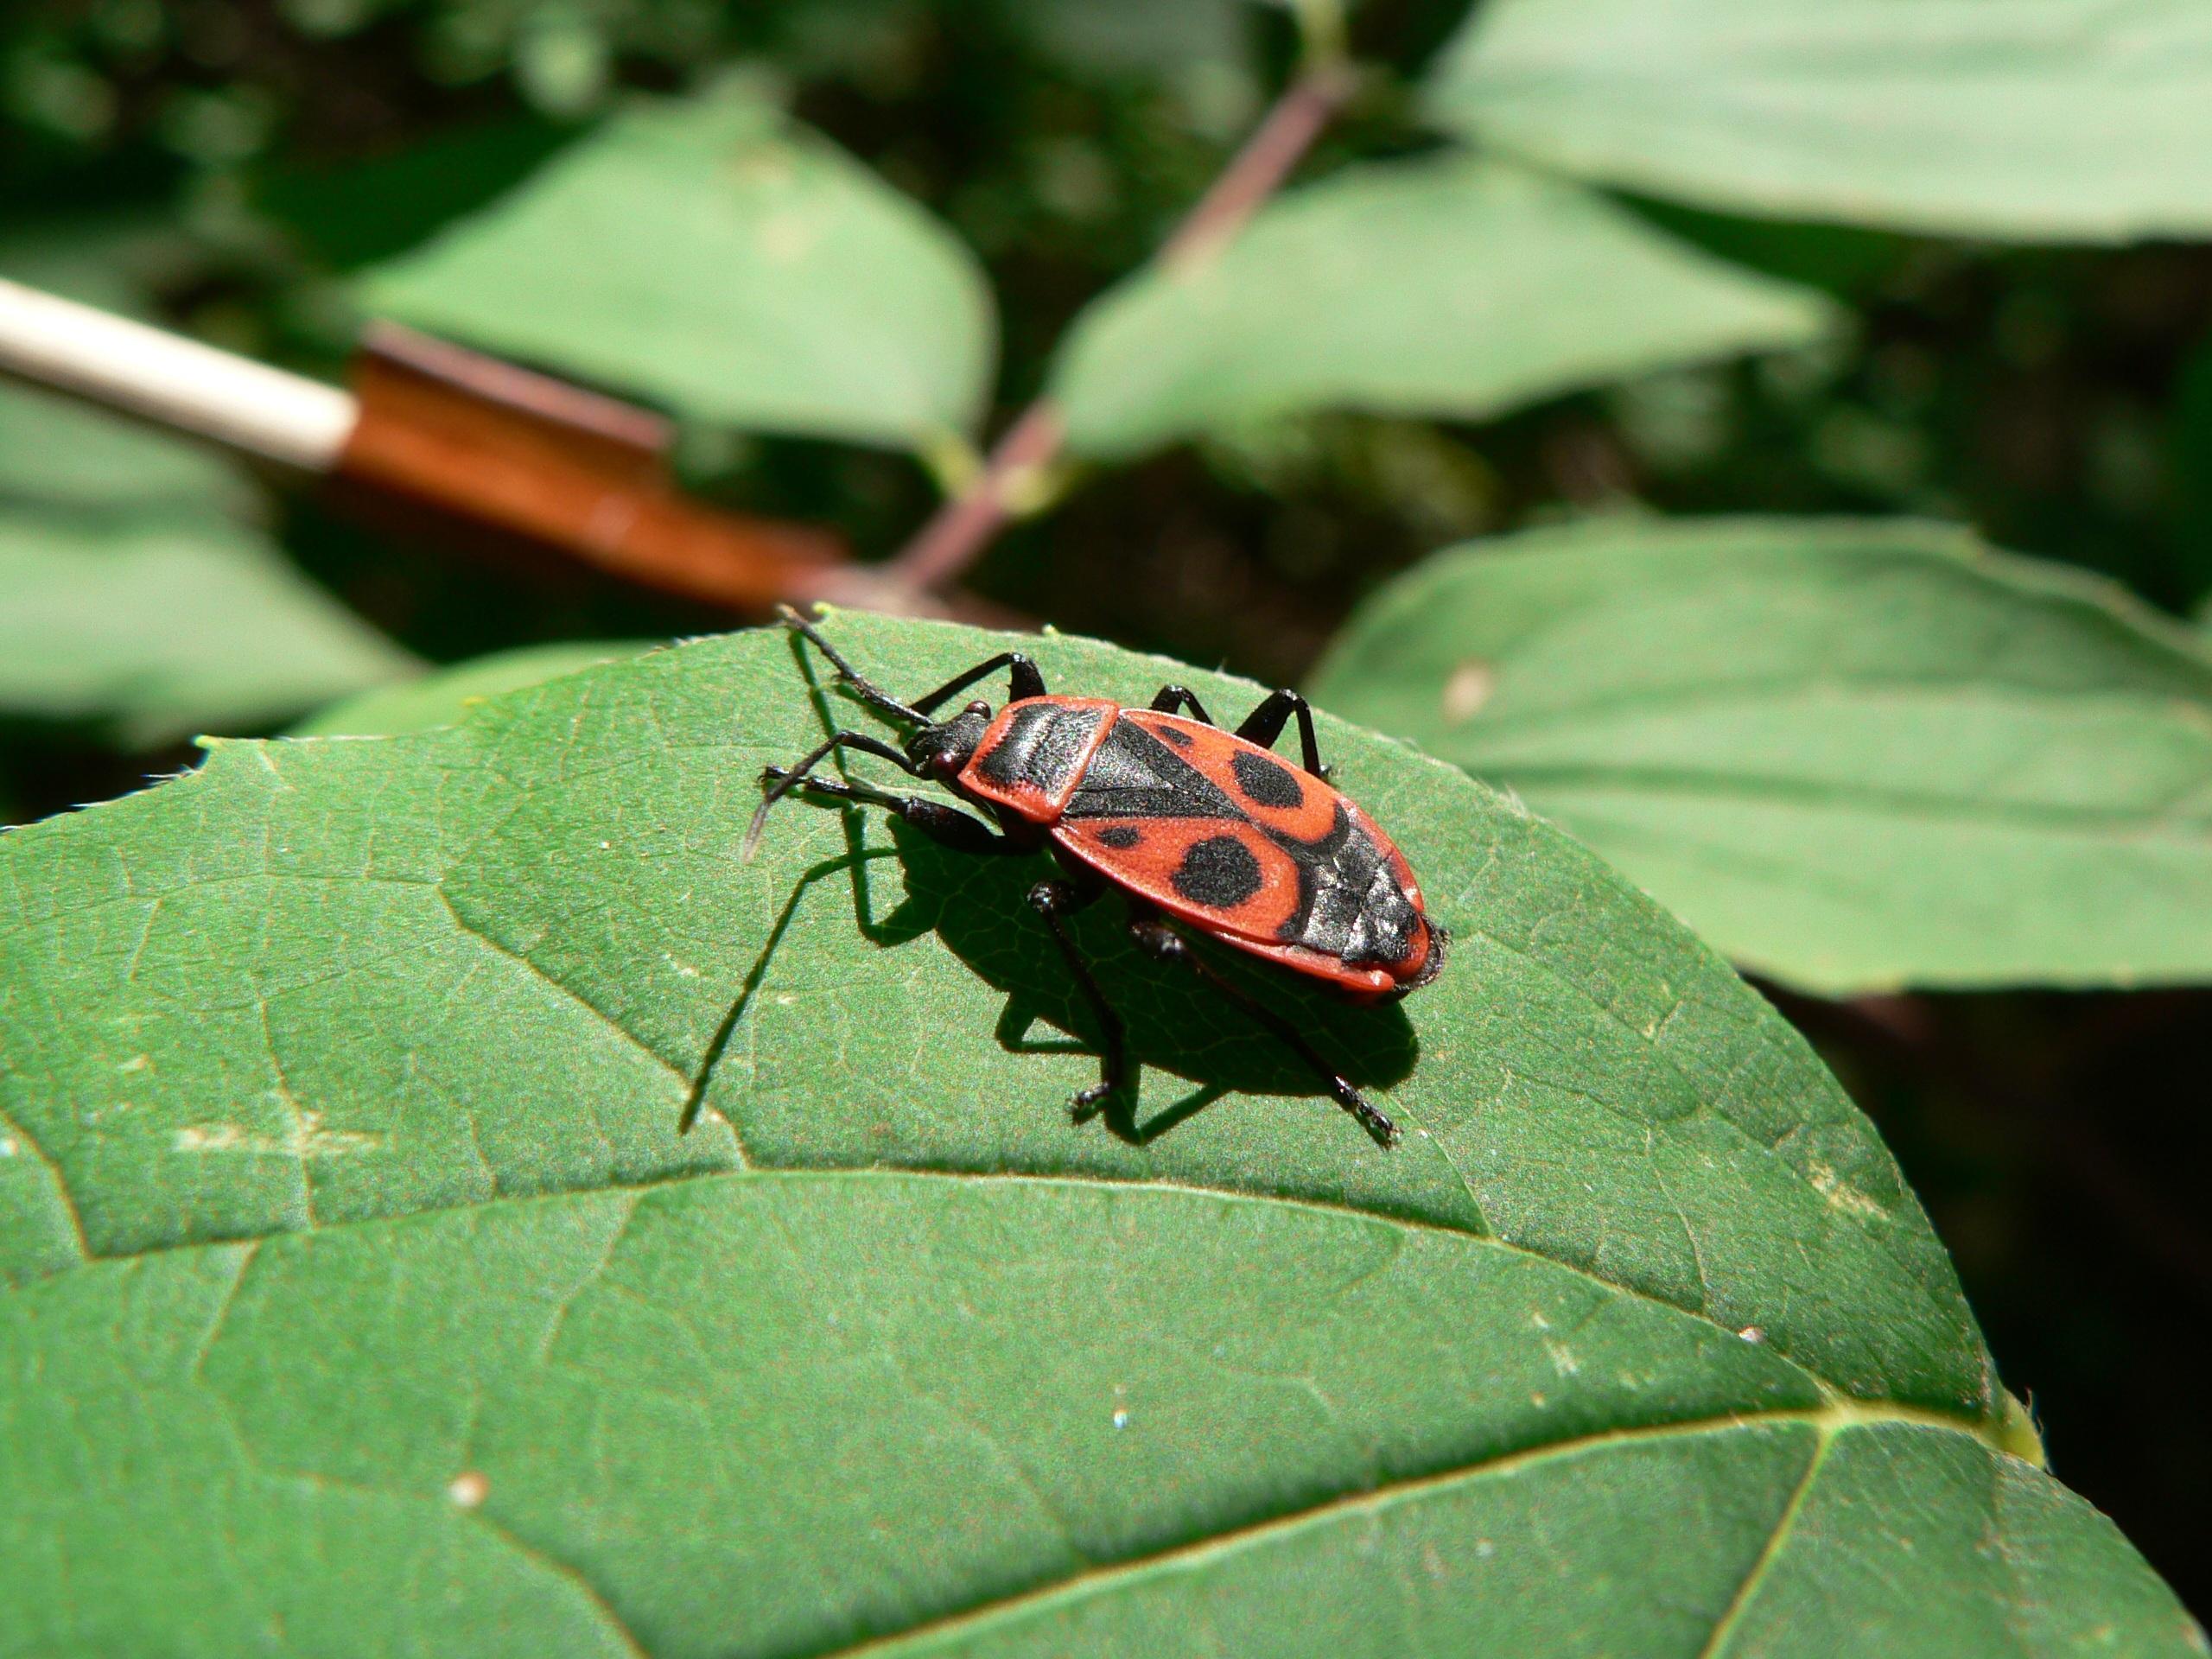 kostenlose foto natur wald blatt blume rot insekt. Black Bedroom Furniture Sets. Home Design Ideas